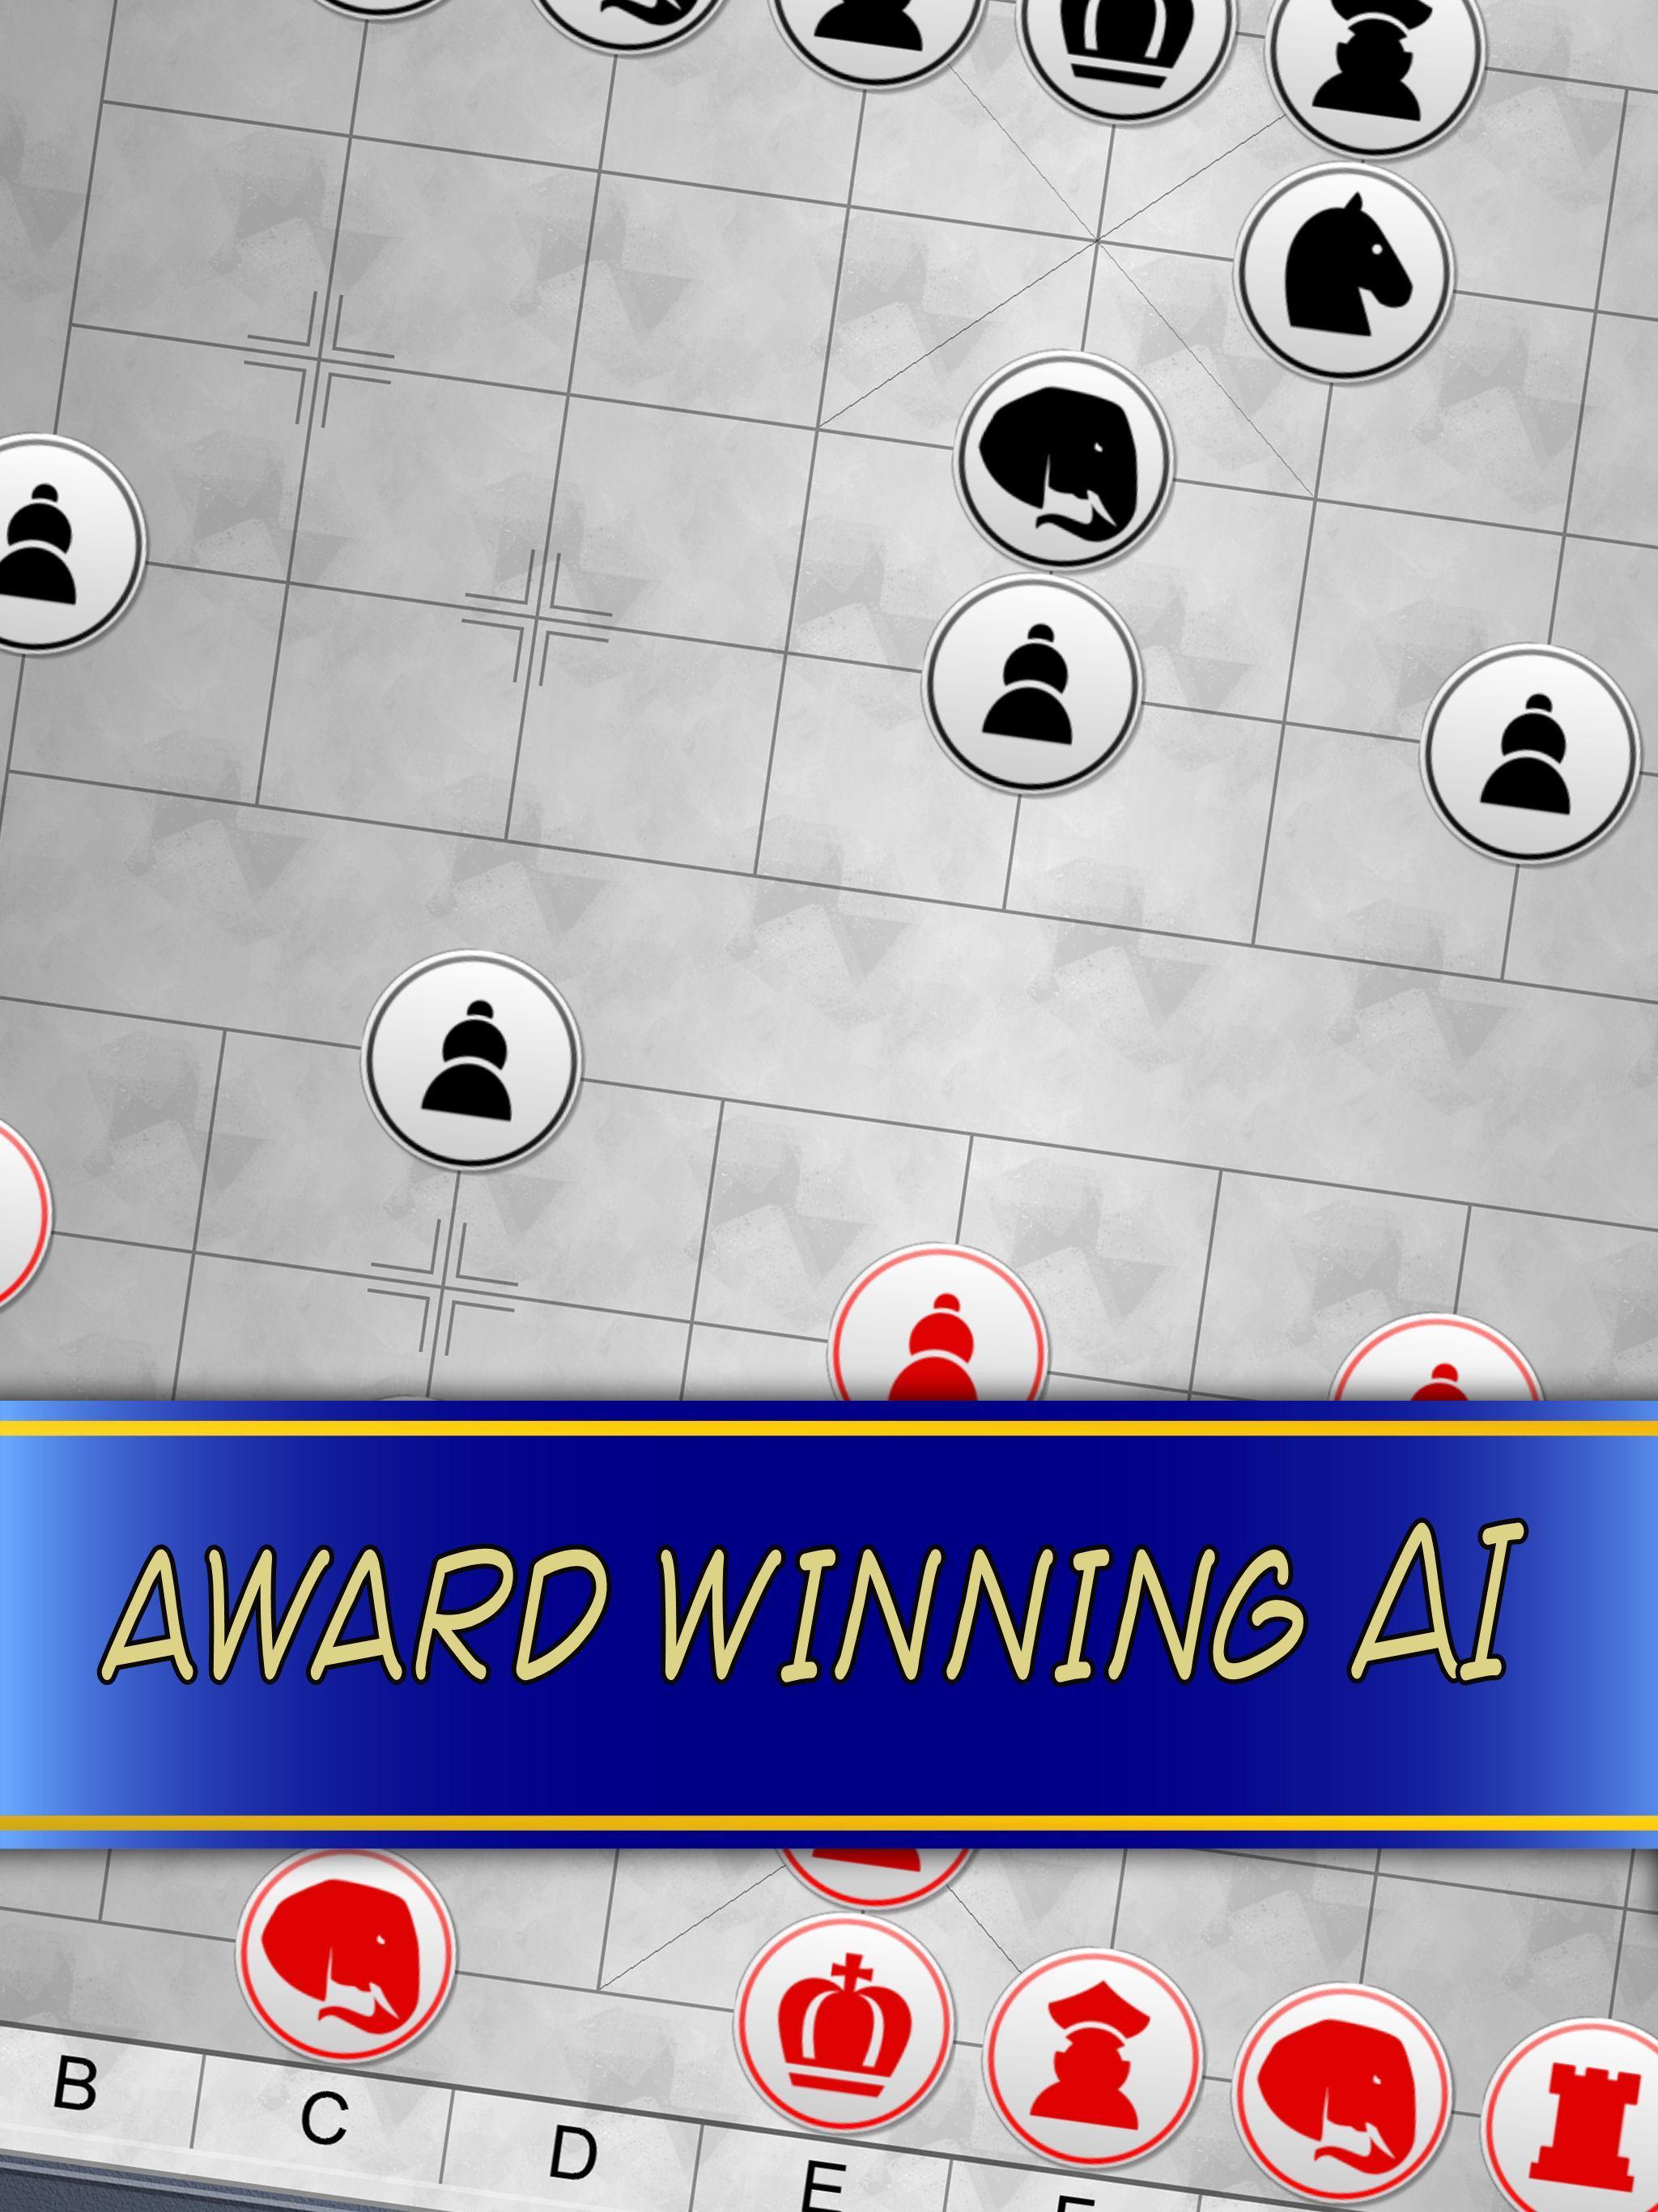 Chinese Chess V+, multiplayer Xiangqi board game 5.25.65 Screenshot 15